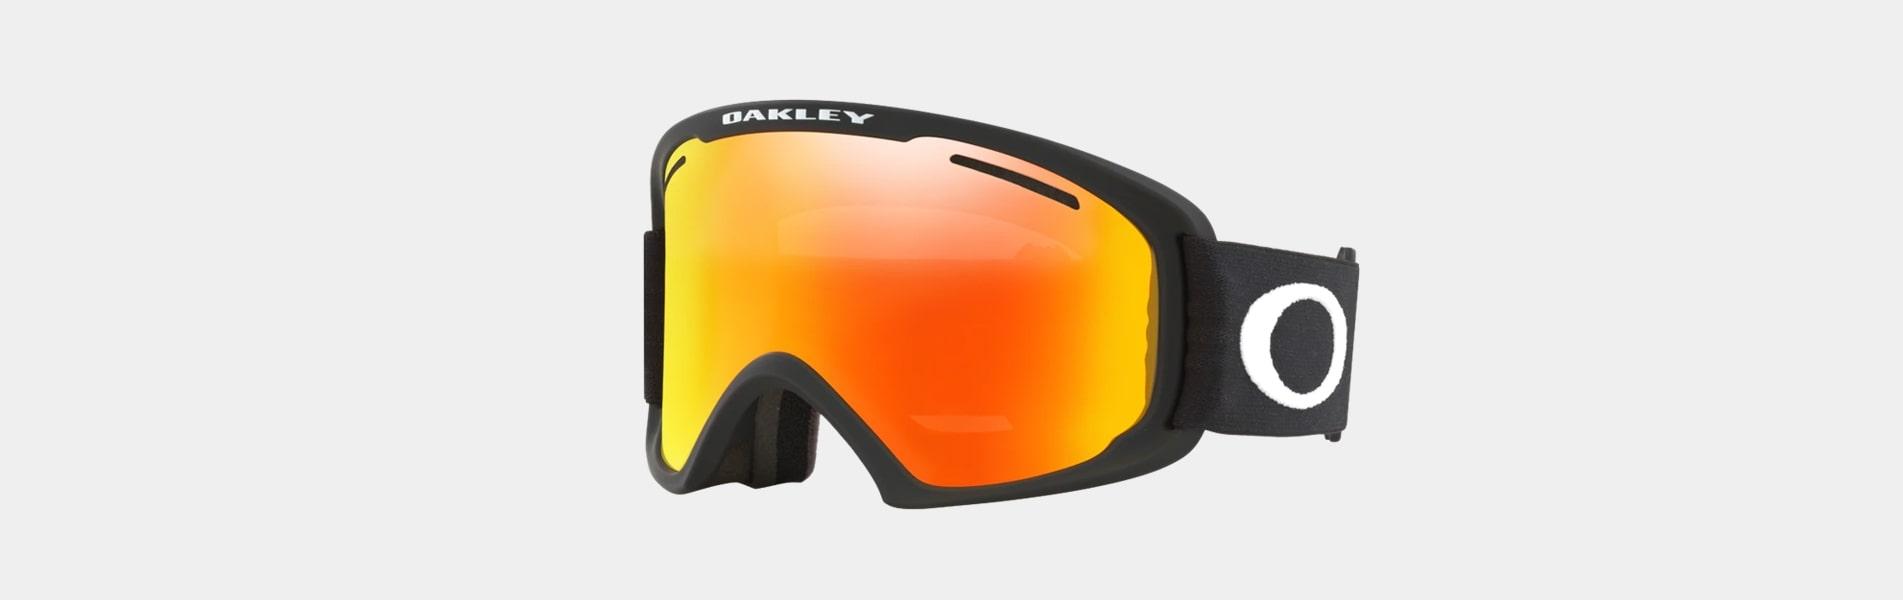 Ski & snowboard goggles